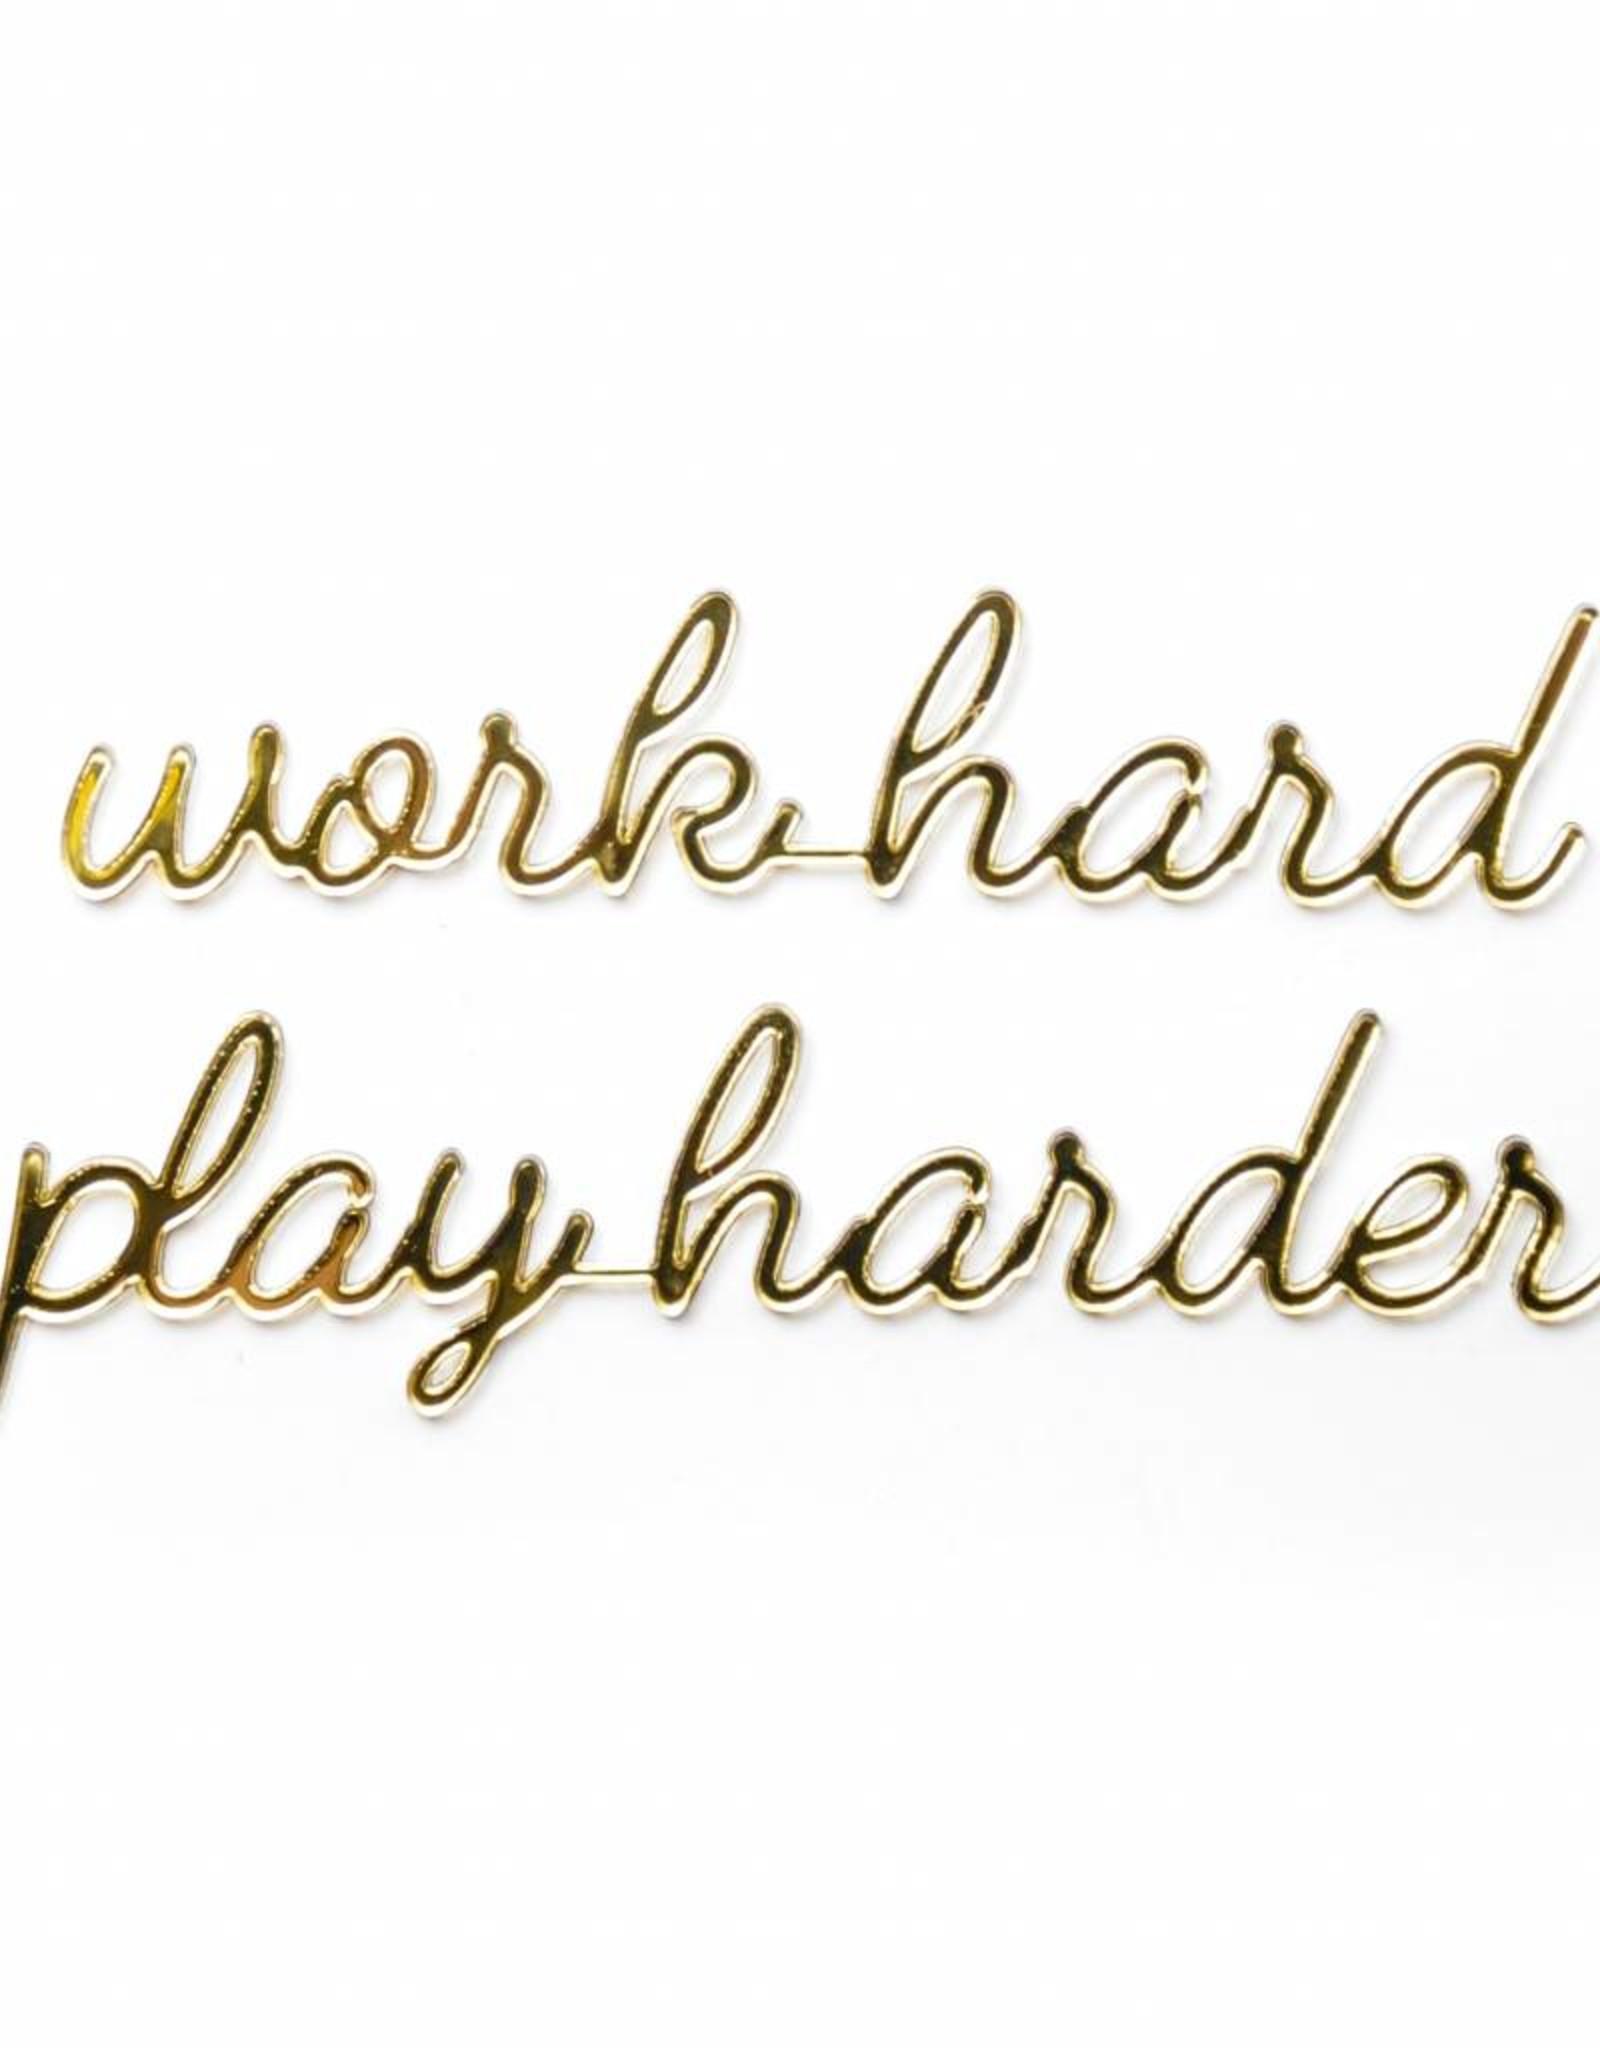 Goegezegd Quote work hard play harder-gold